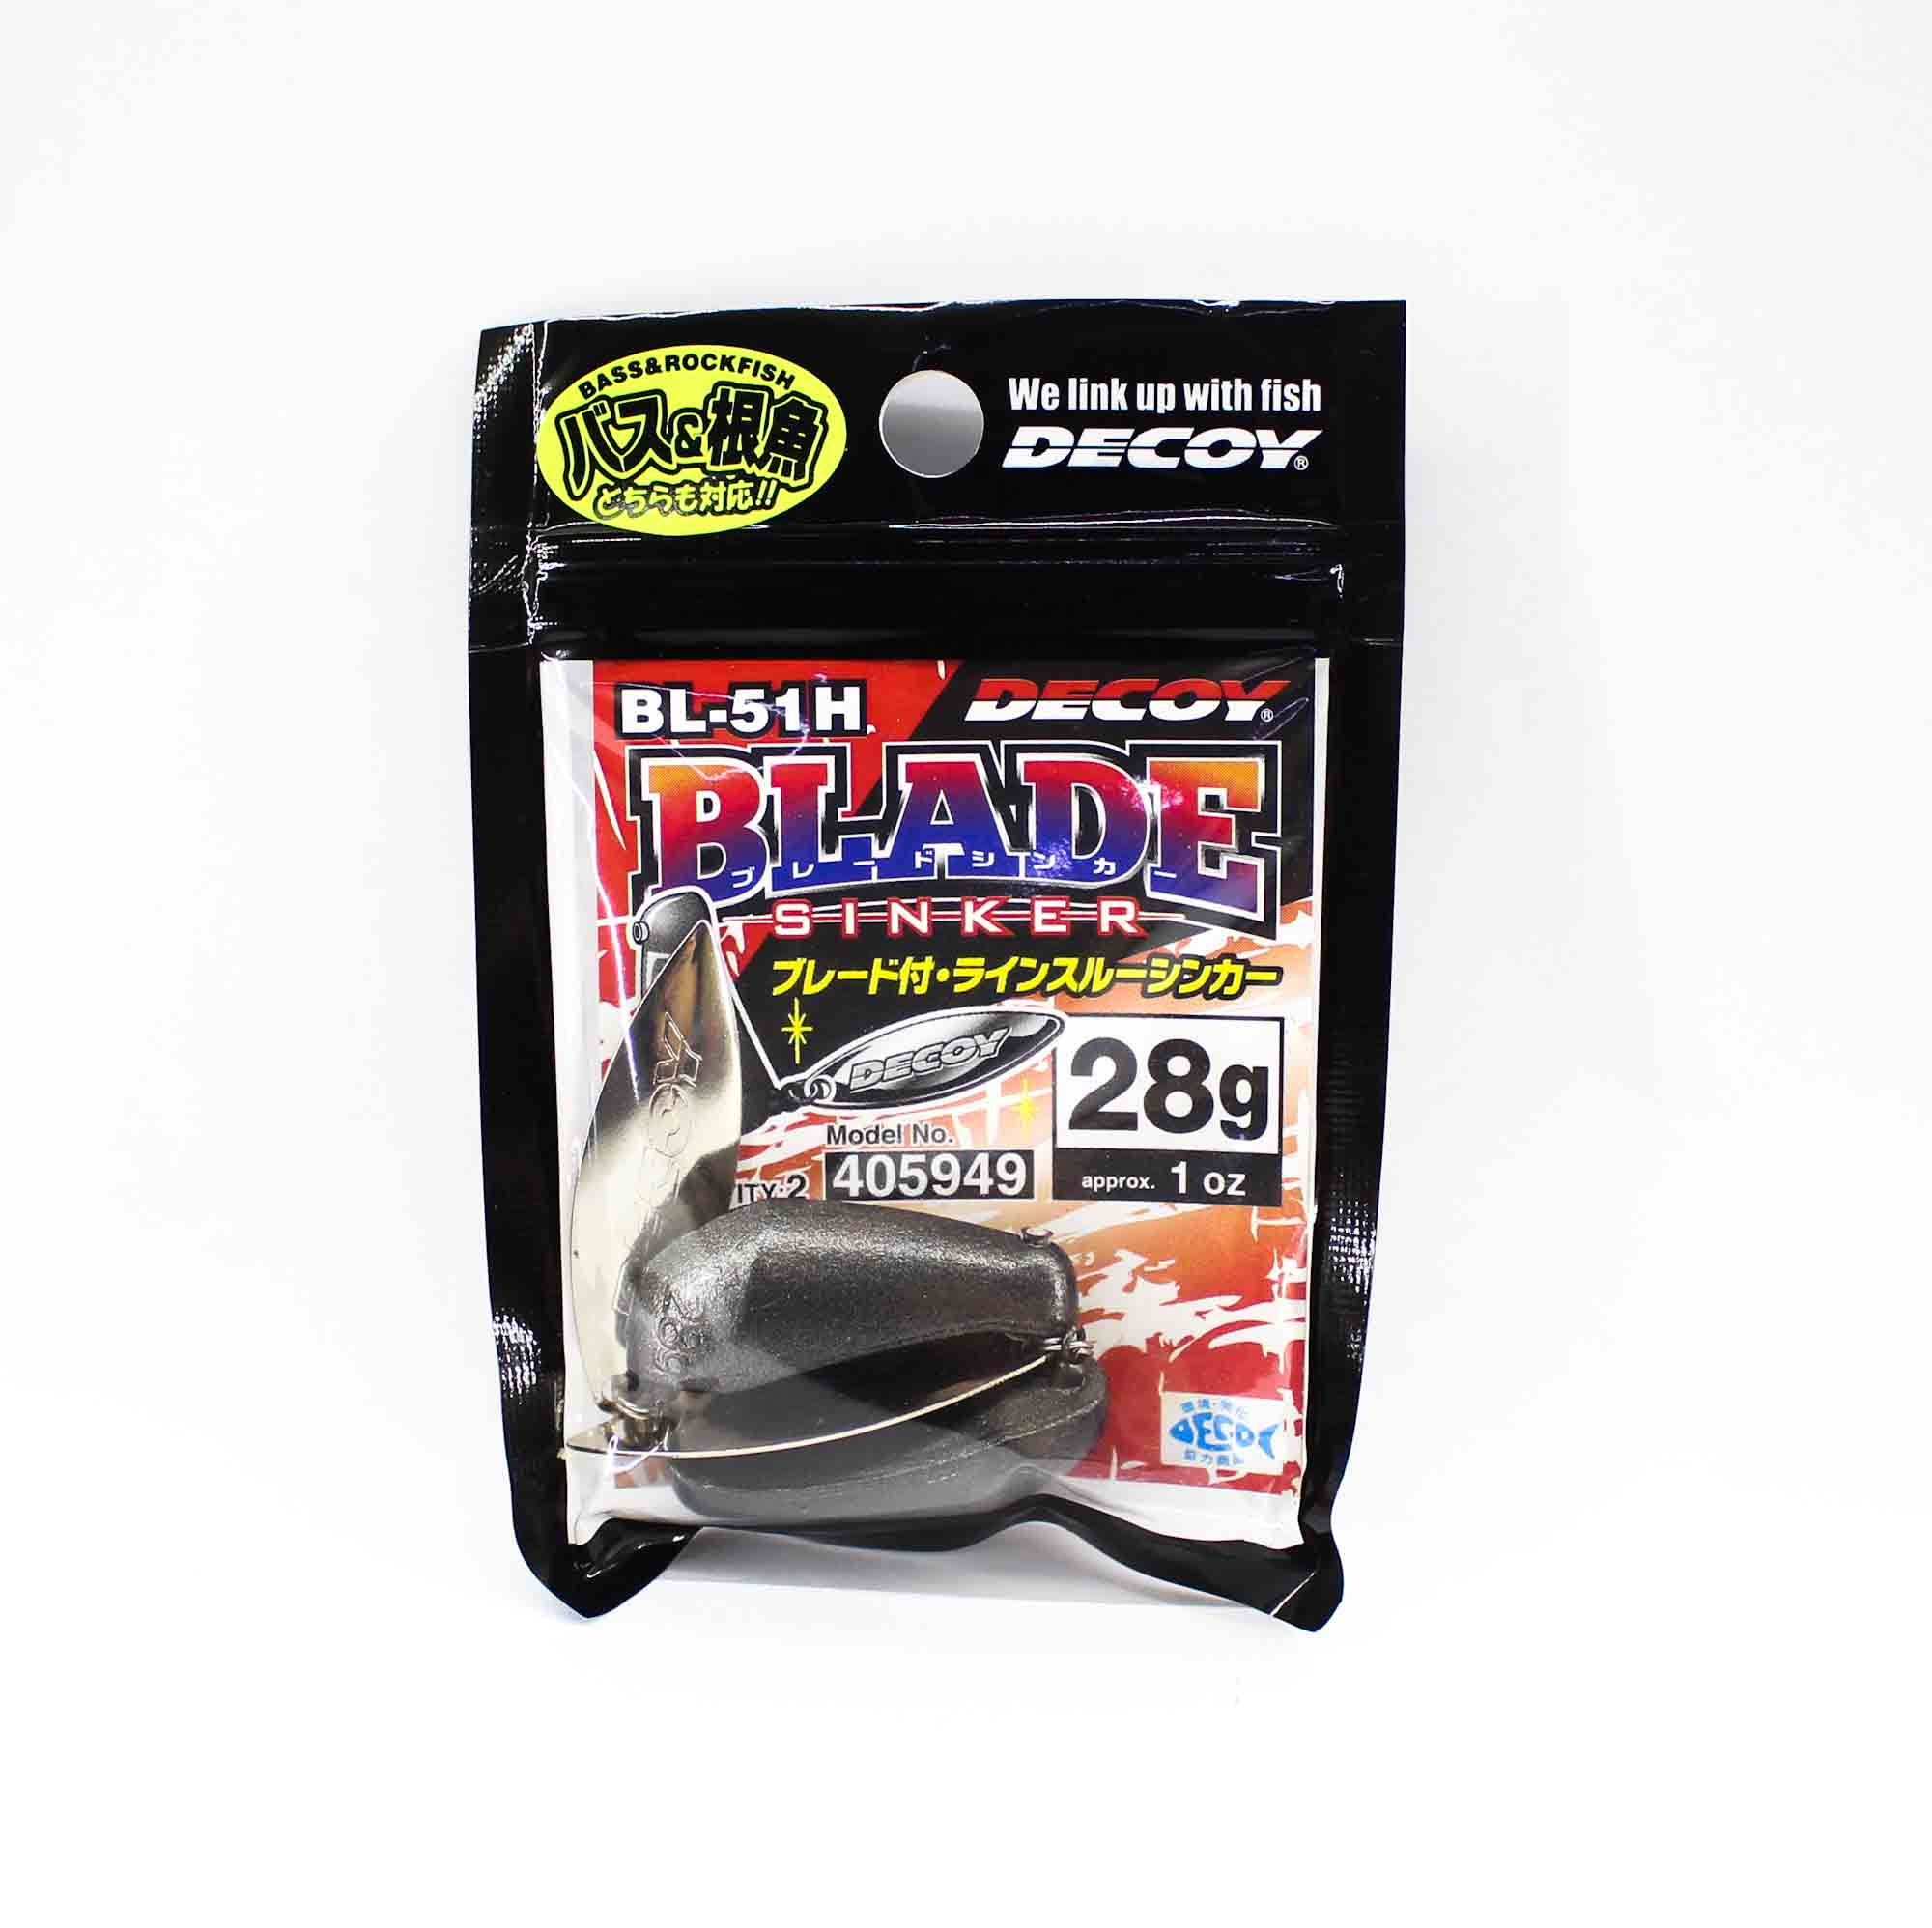 Decoy BL-51H Blade Sinker Size 28 grams (5949)